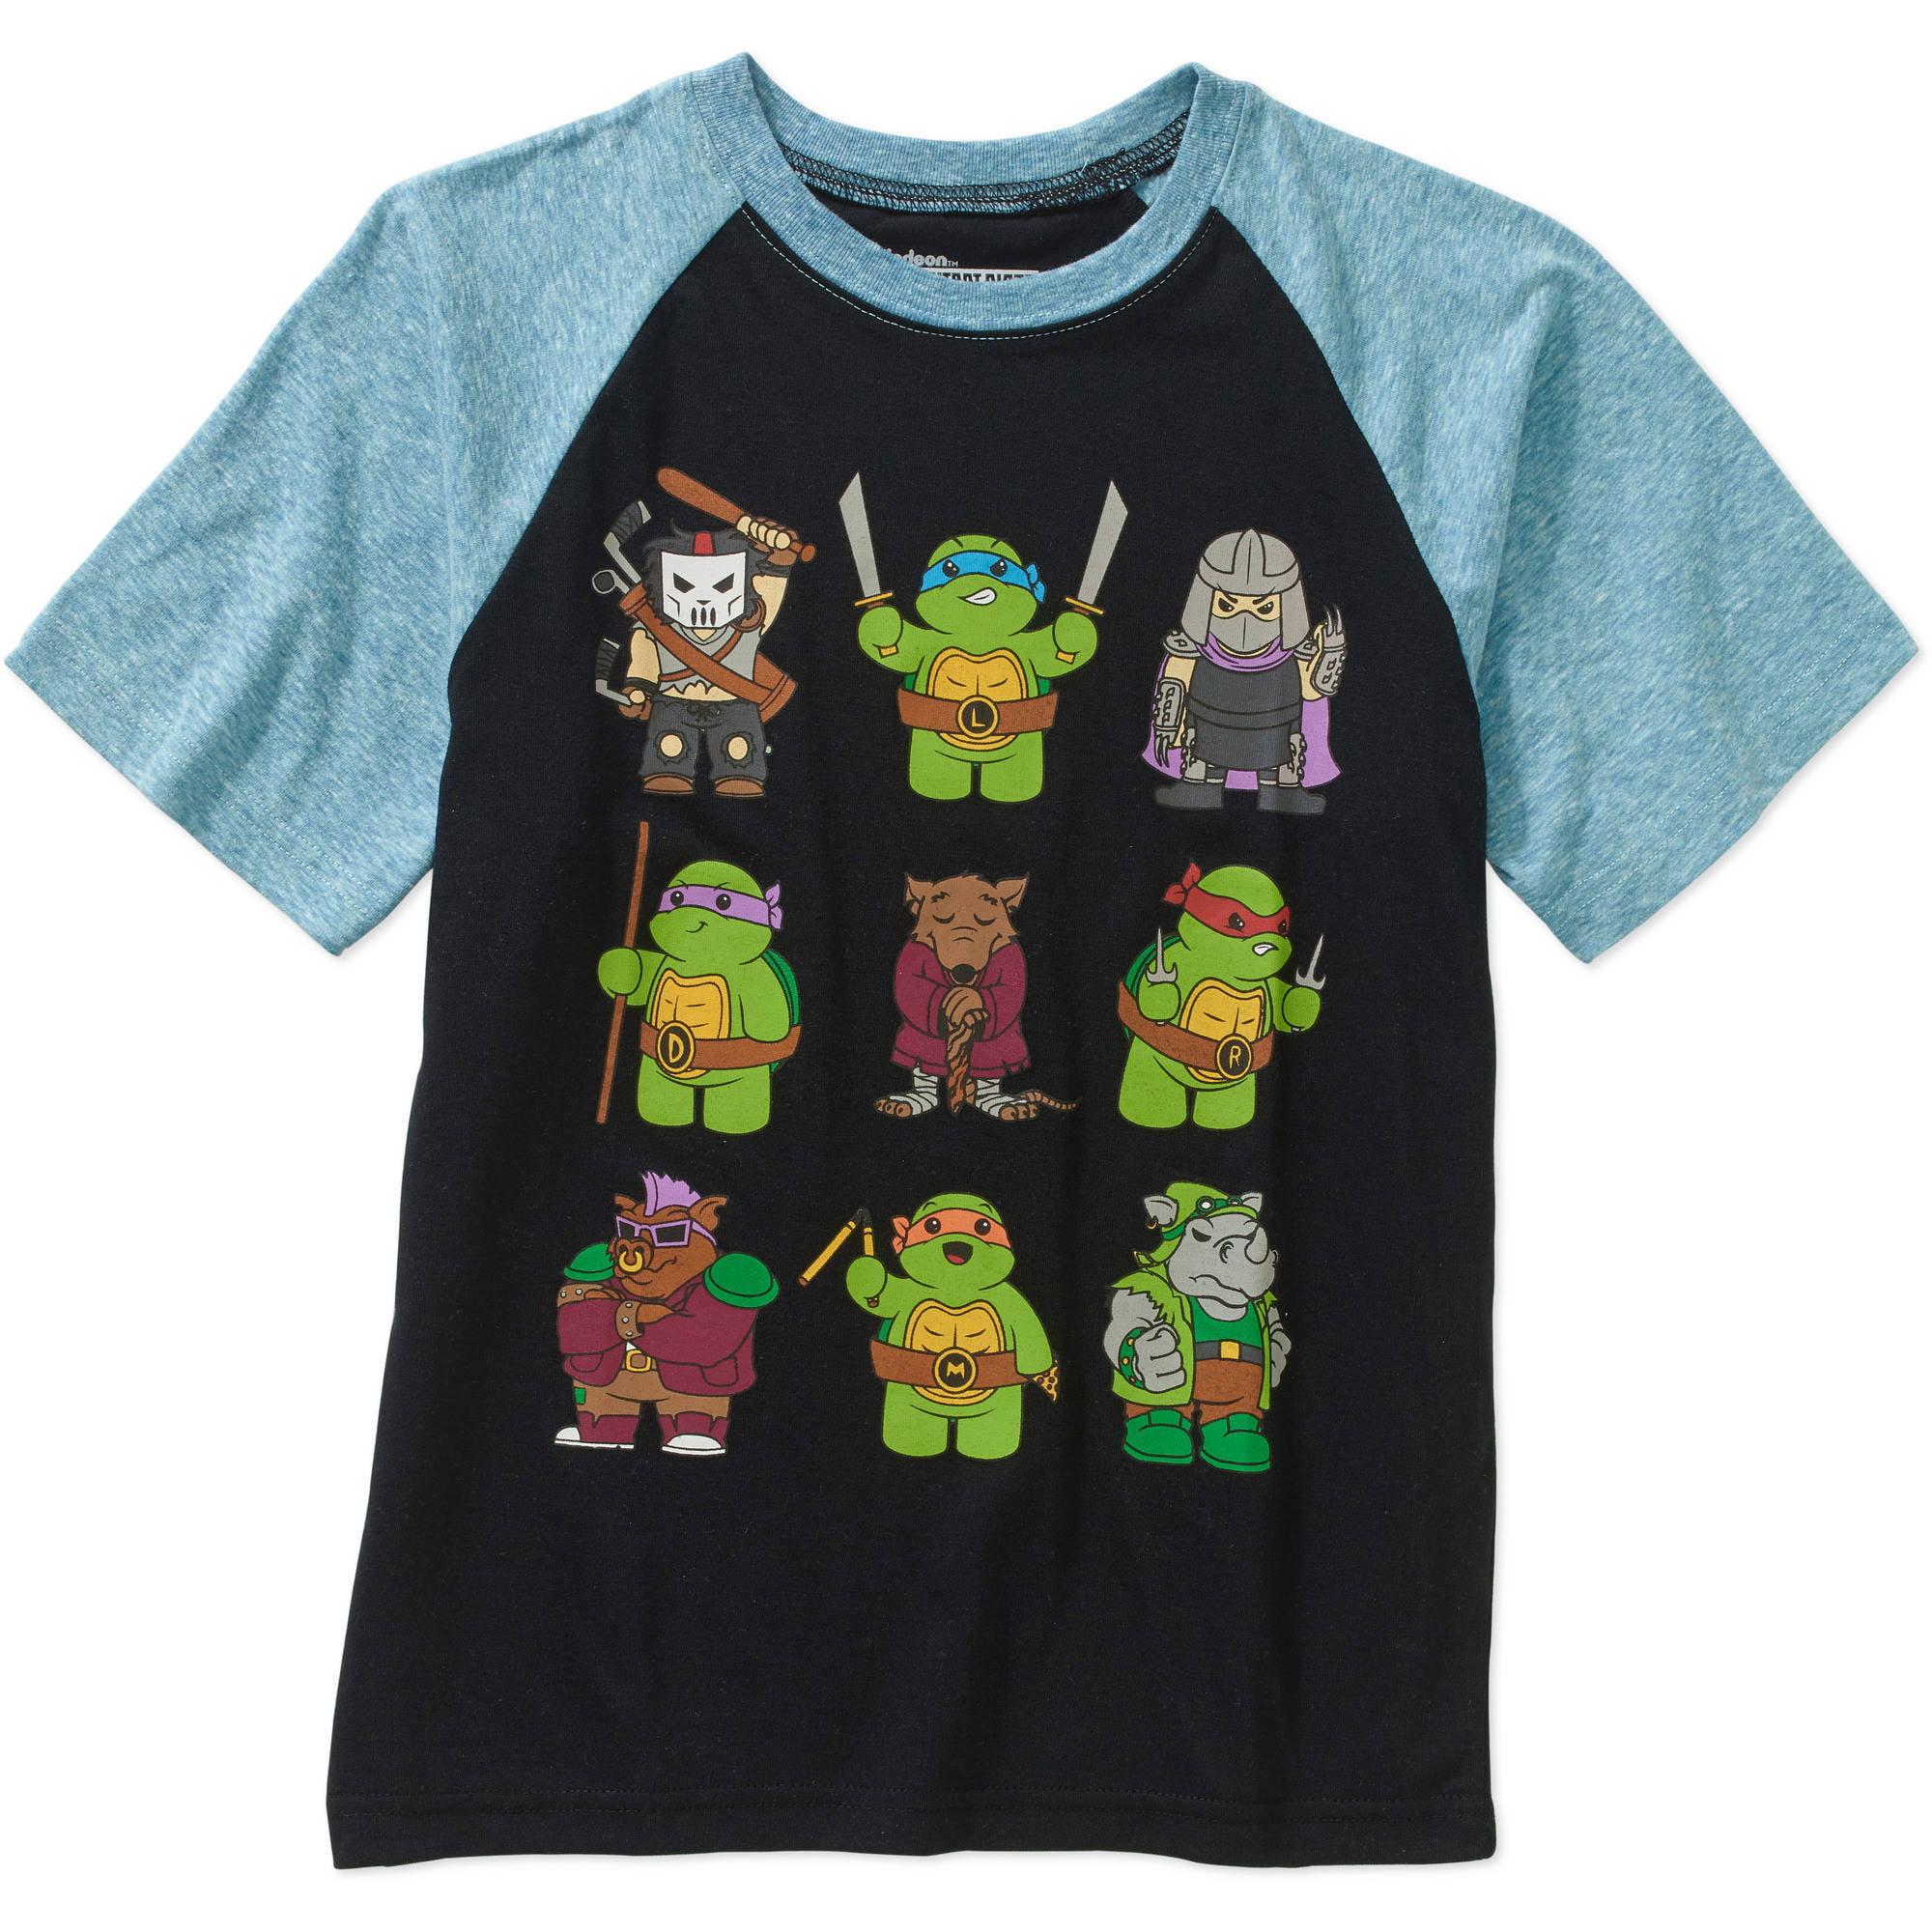 6 TMNT Shoe Charms Crocs Jibbitz Teenage Mutant Ninja Turtles Splinter Shredder